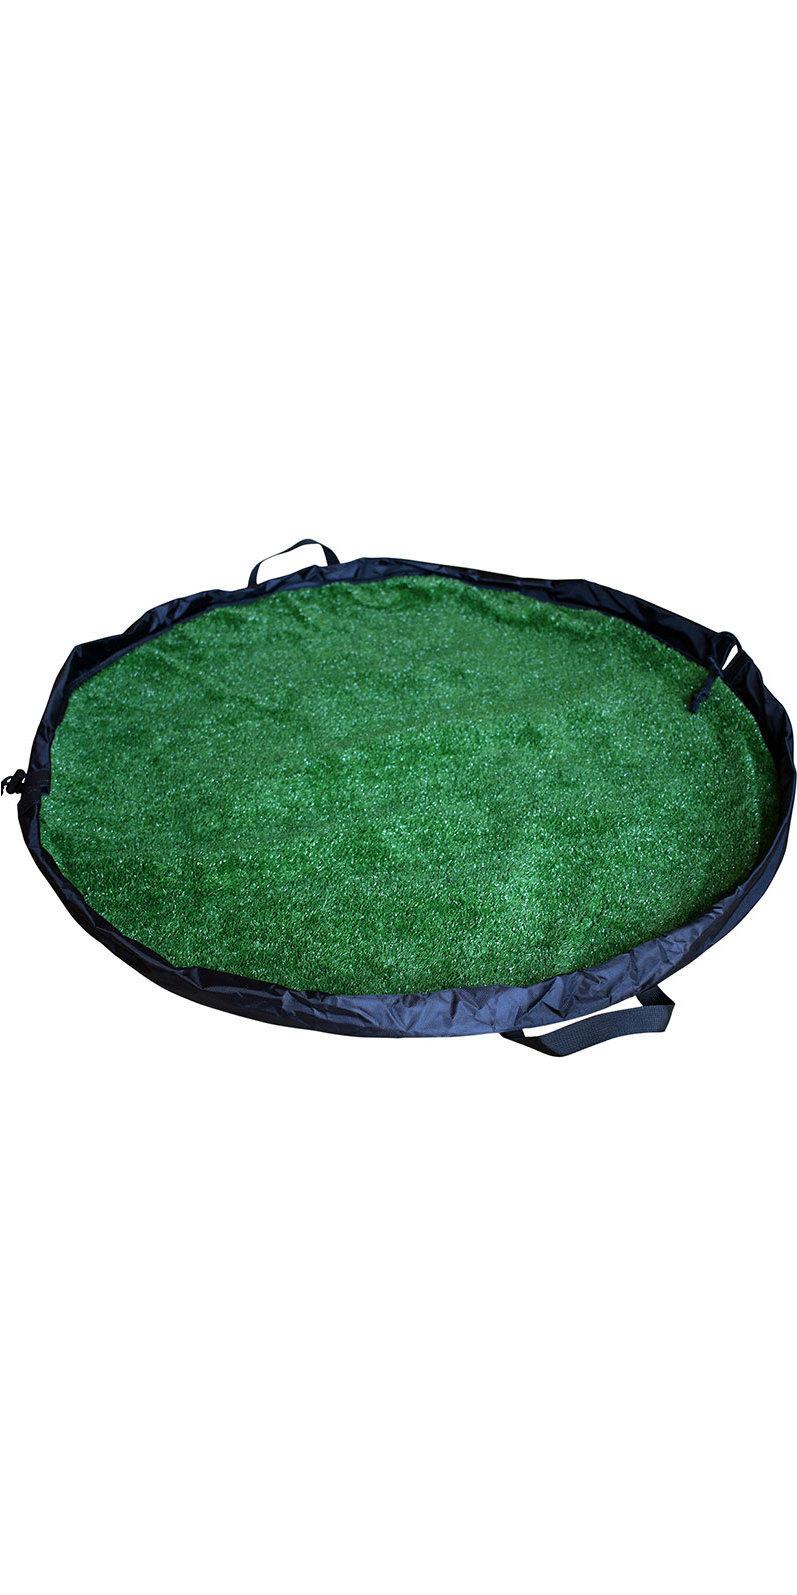 2019 Northcore Grass Waterproof Change Mat / Bag NOCOM02